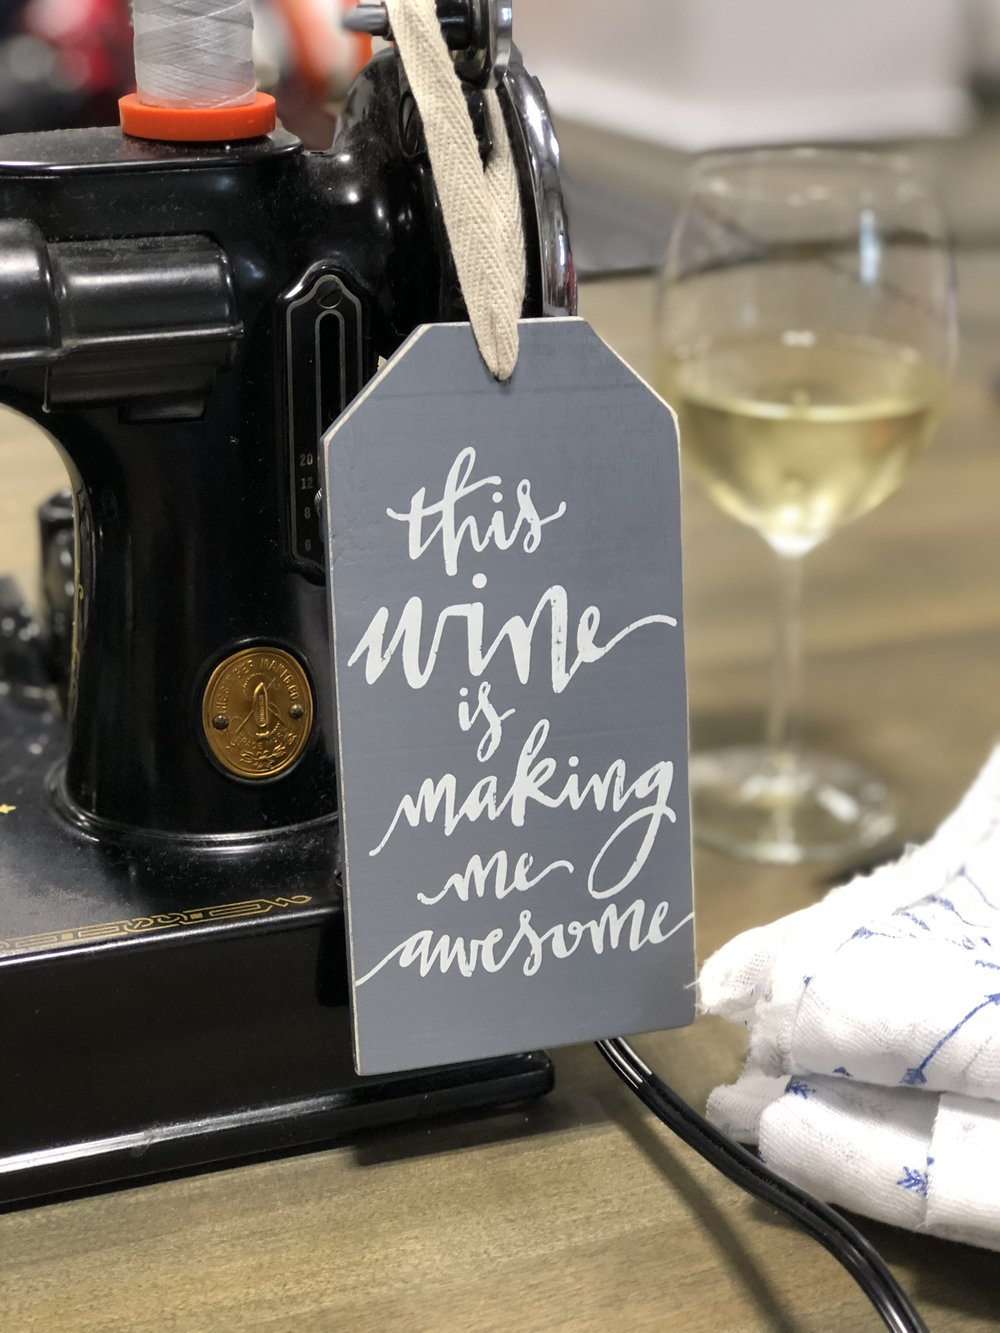 Cute wine bottle label found in town